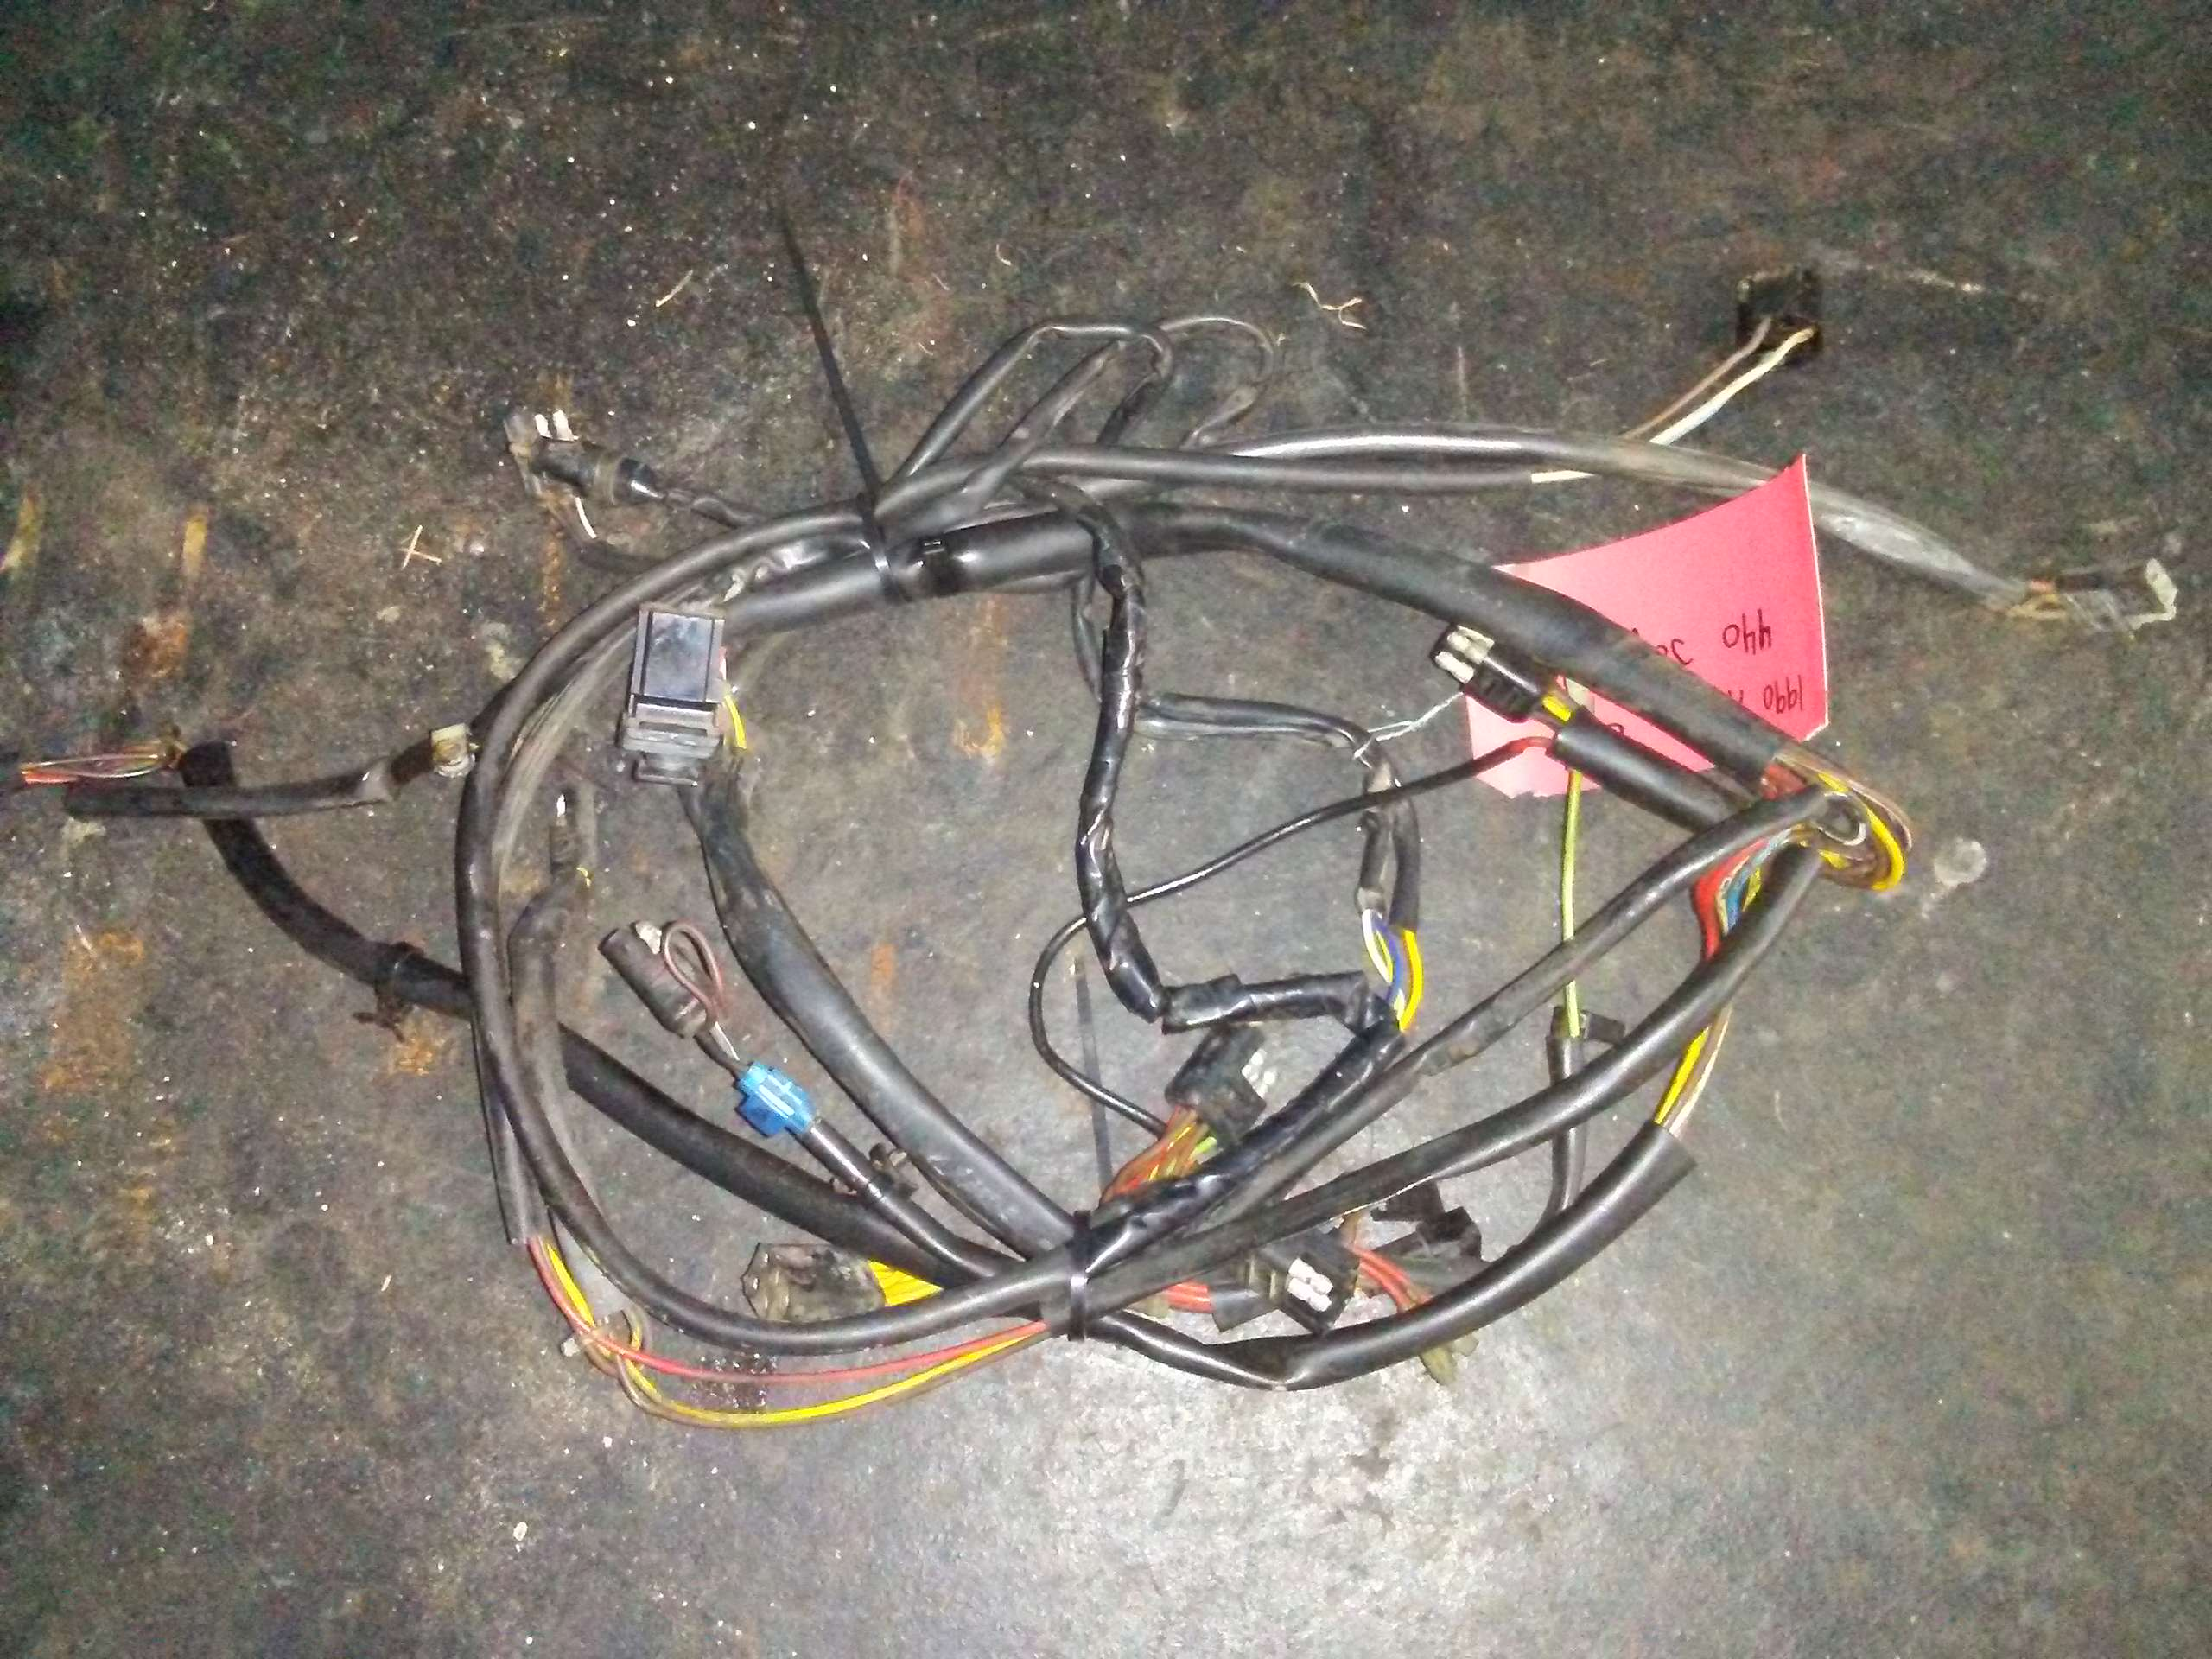 1990 – 1991 arctic cat jag 440 main wire harness # 0686-038